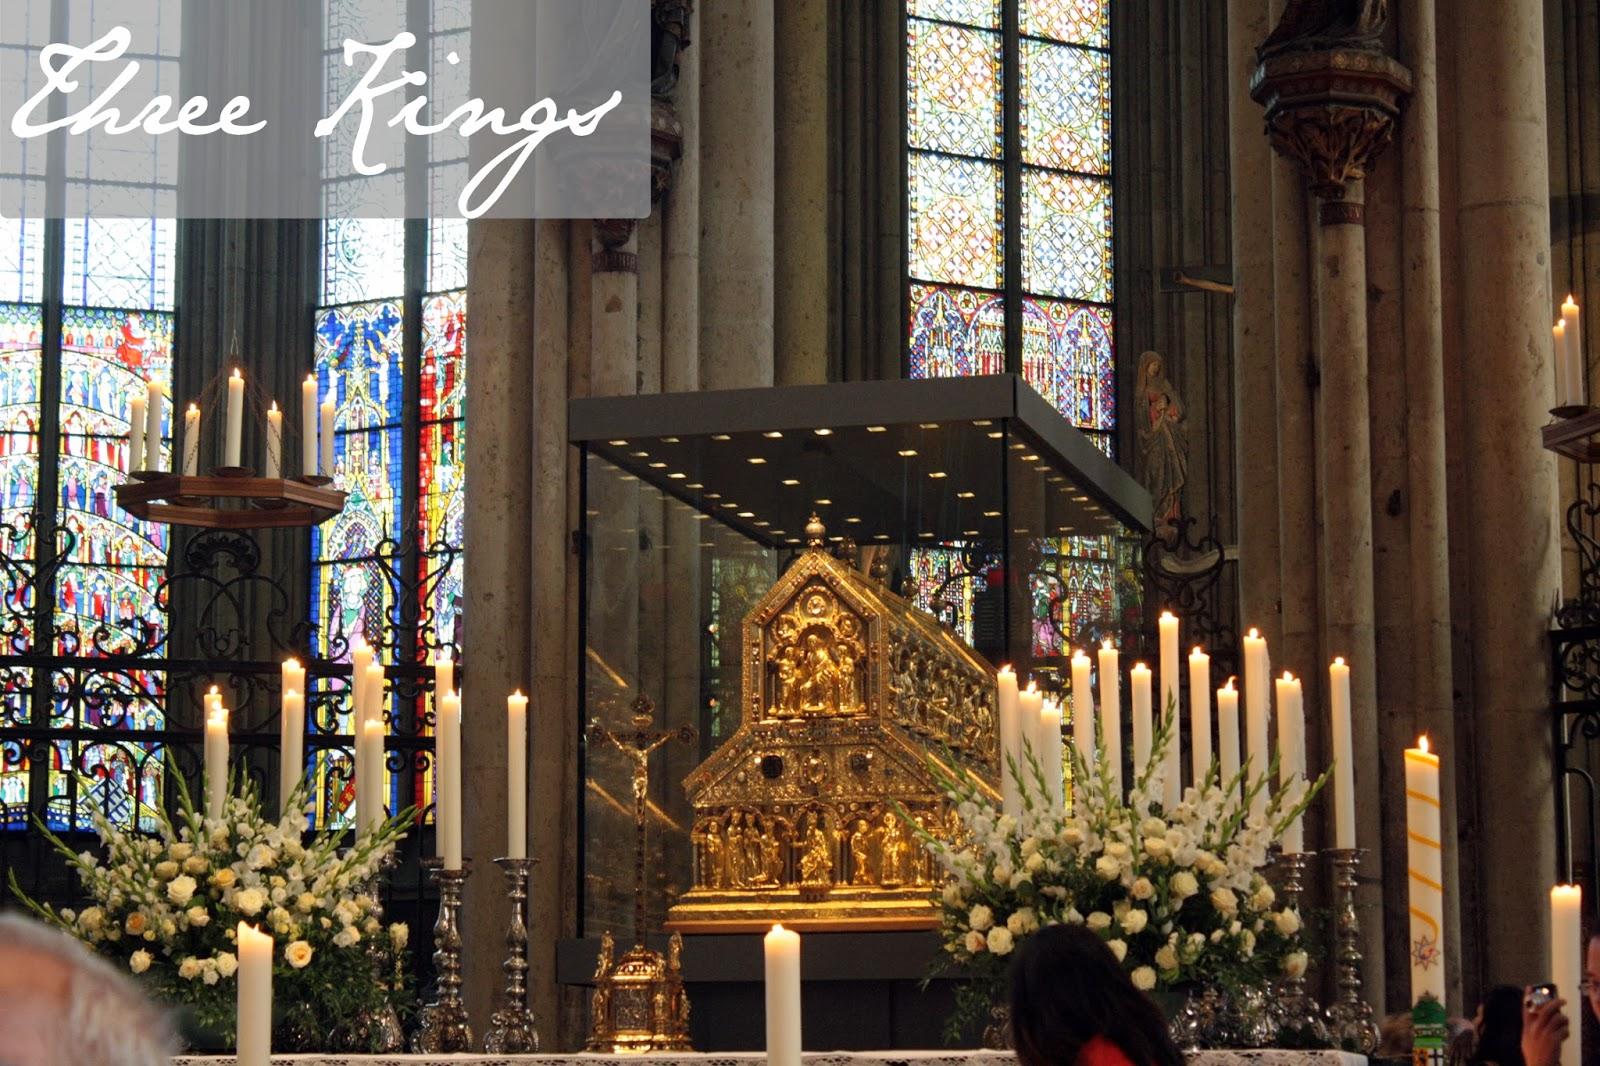 German Gothic Cathedral - tipsyterrier.blogspot.com